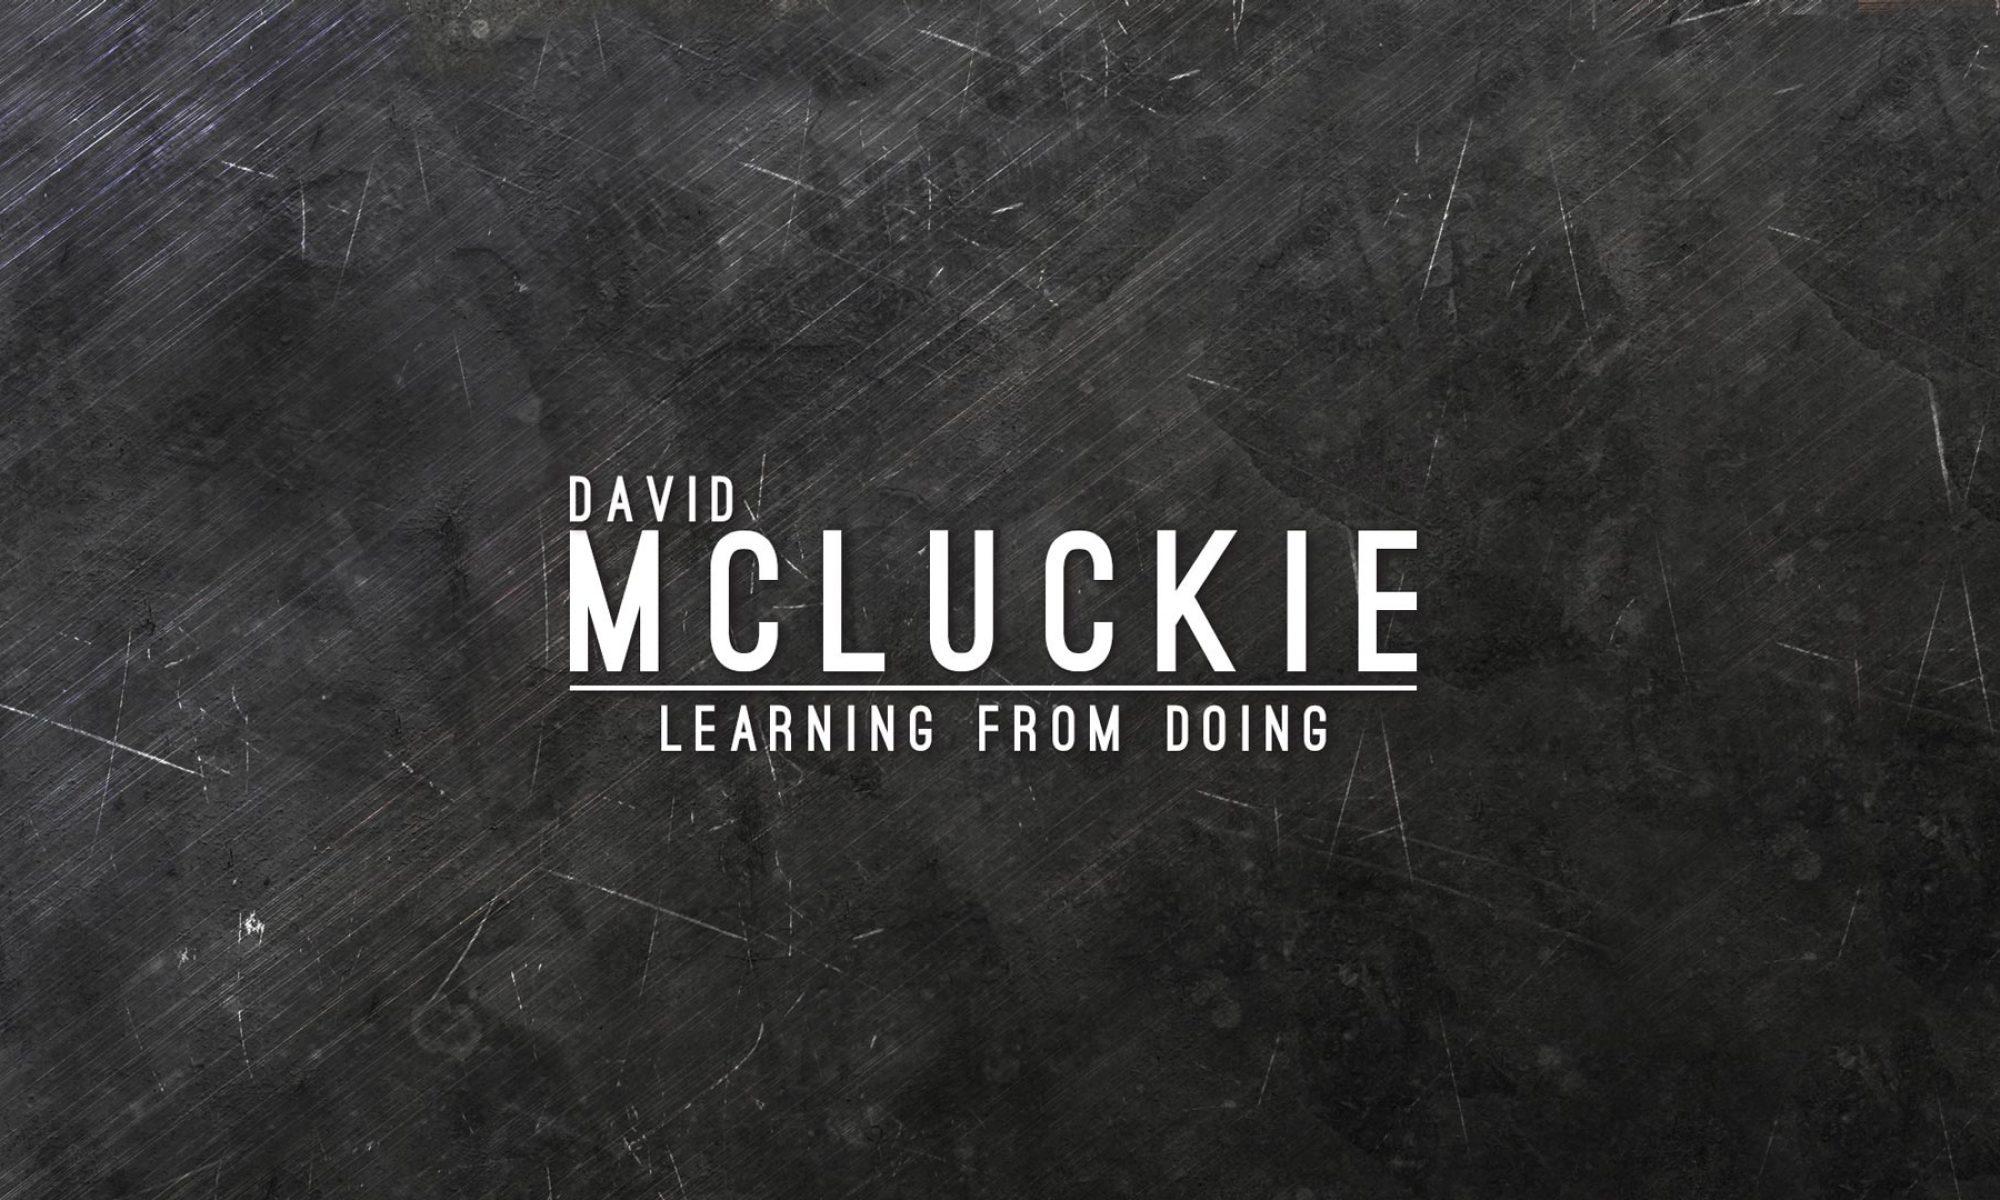 David McLuckie